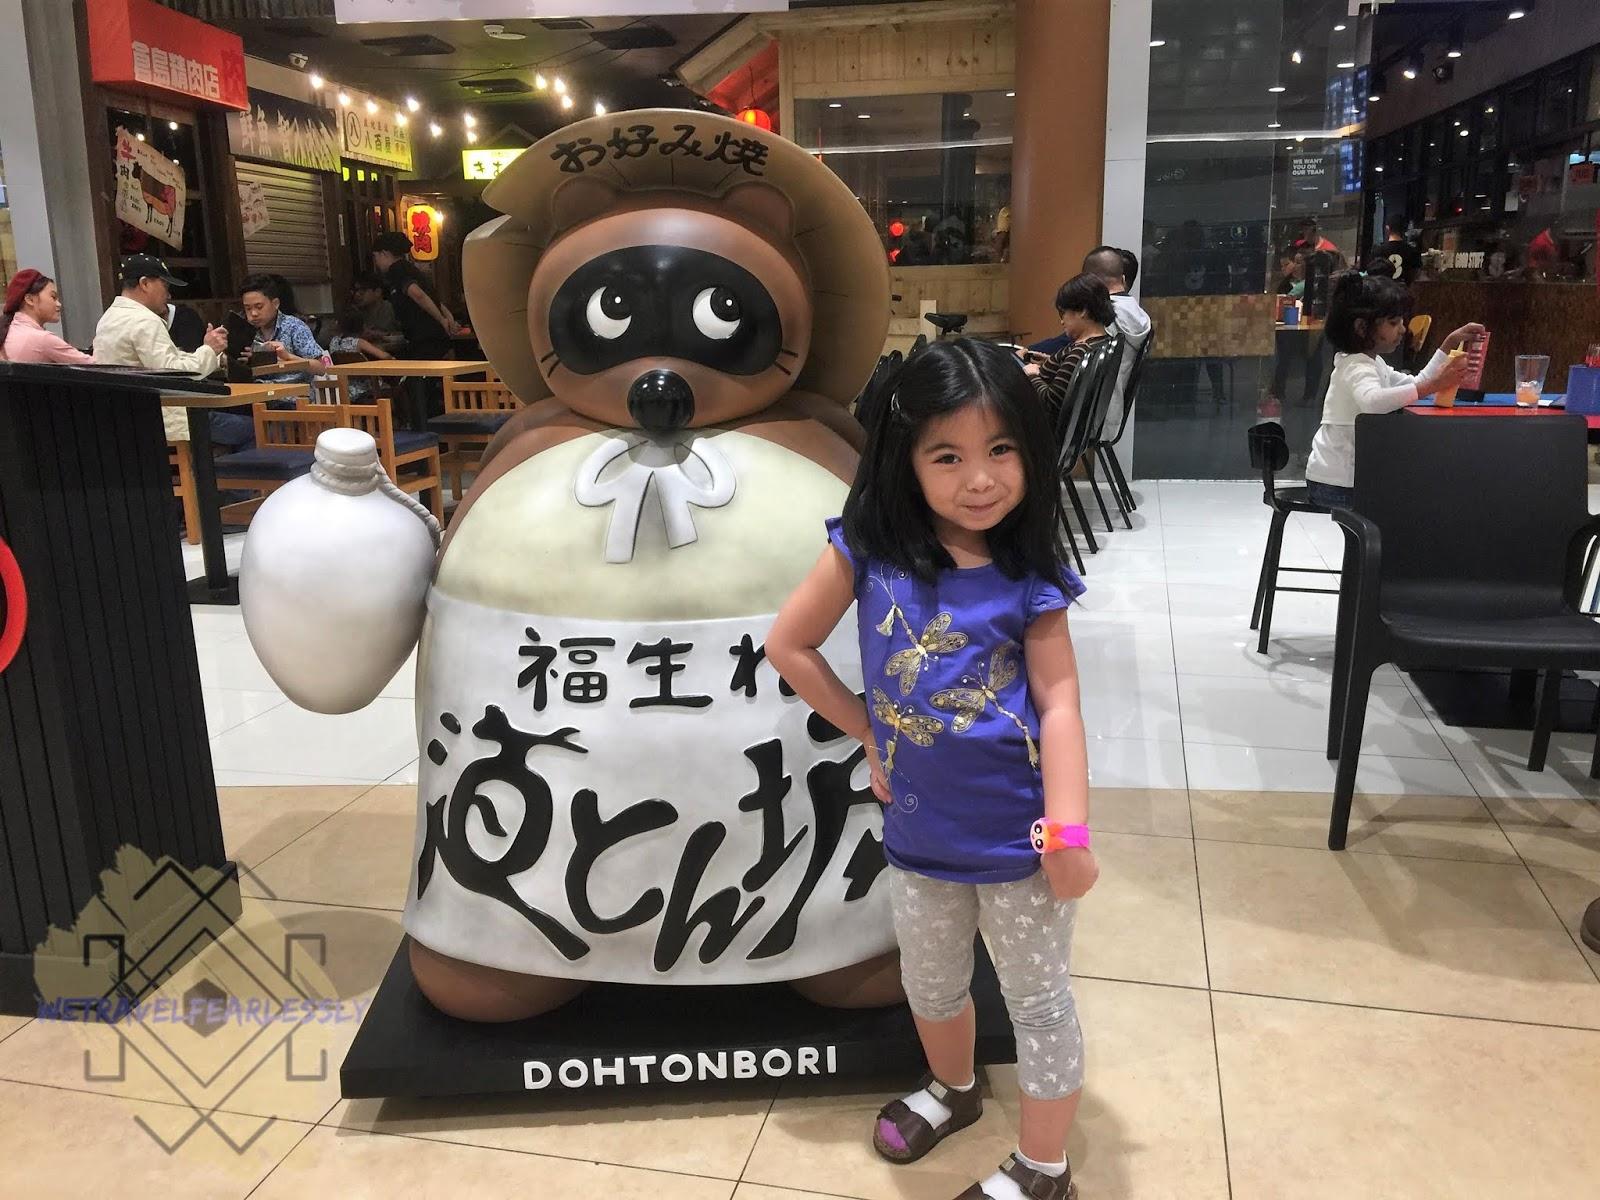 Raccoon Dog - Dohtonbori's brand mascot w/ Chloe of WeTravelFearlessly